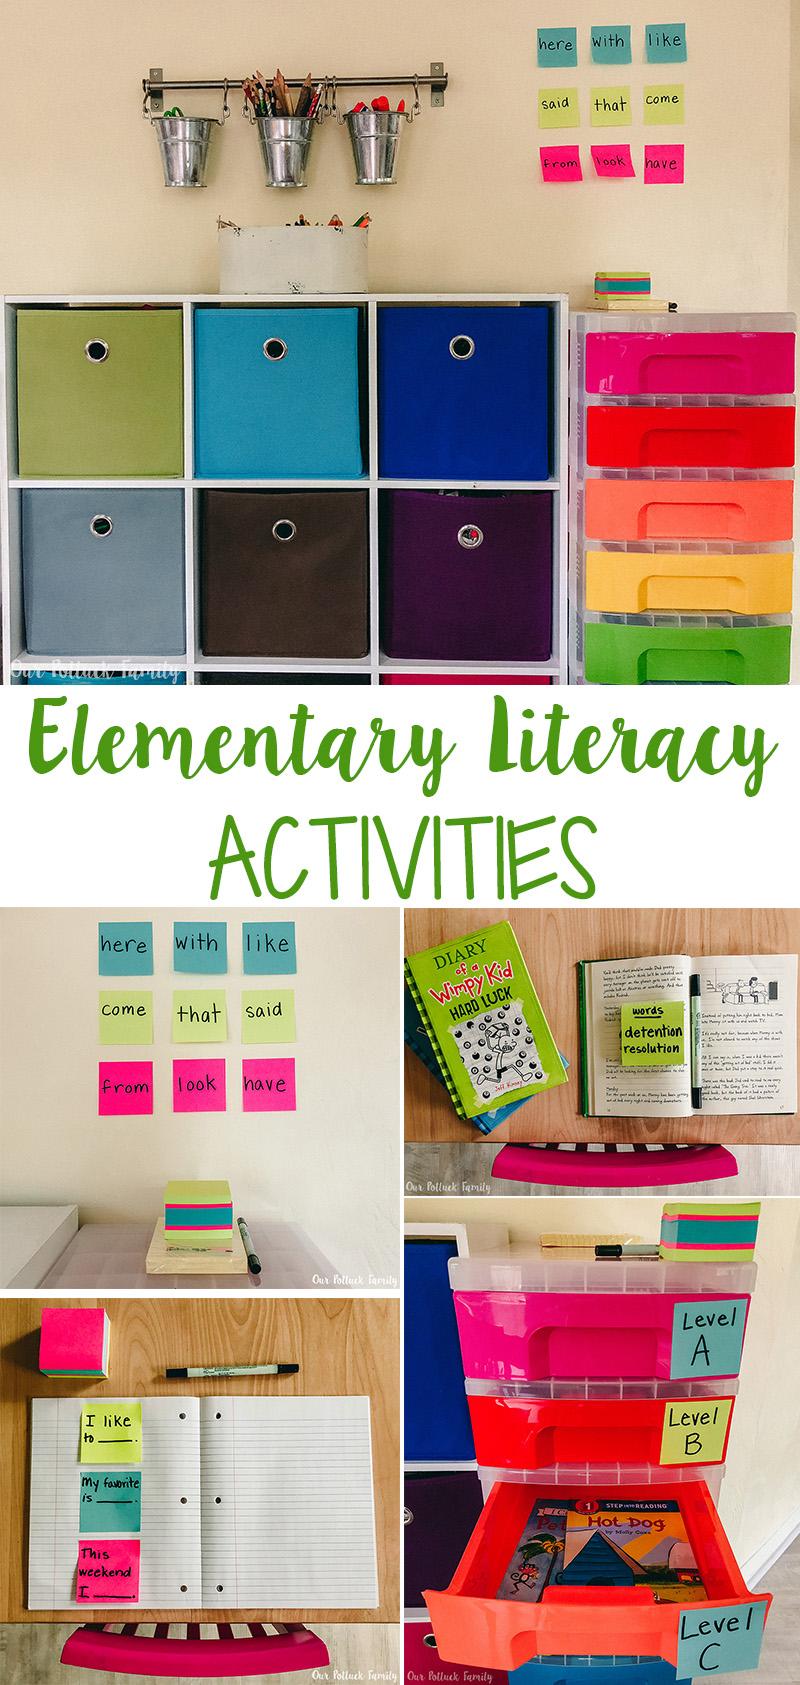 Elementary Literacy Activities